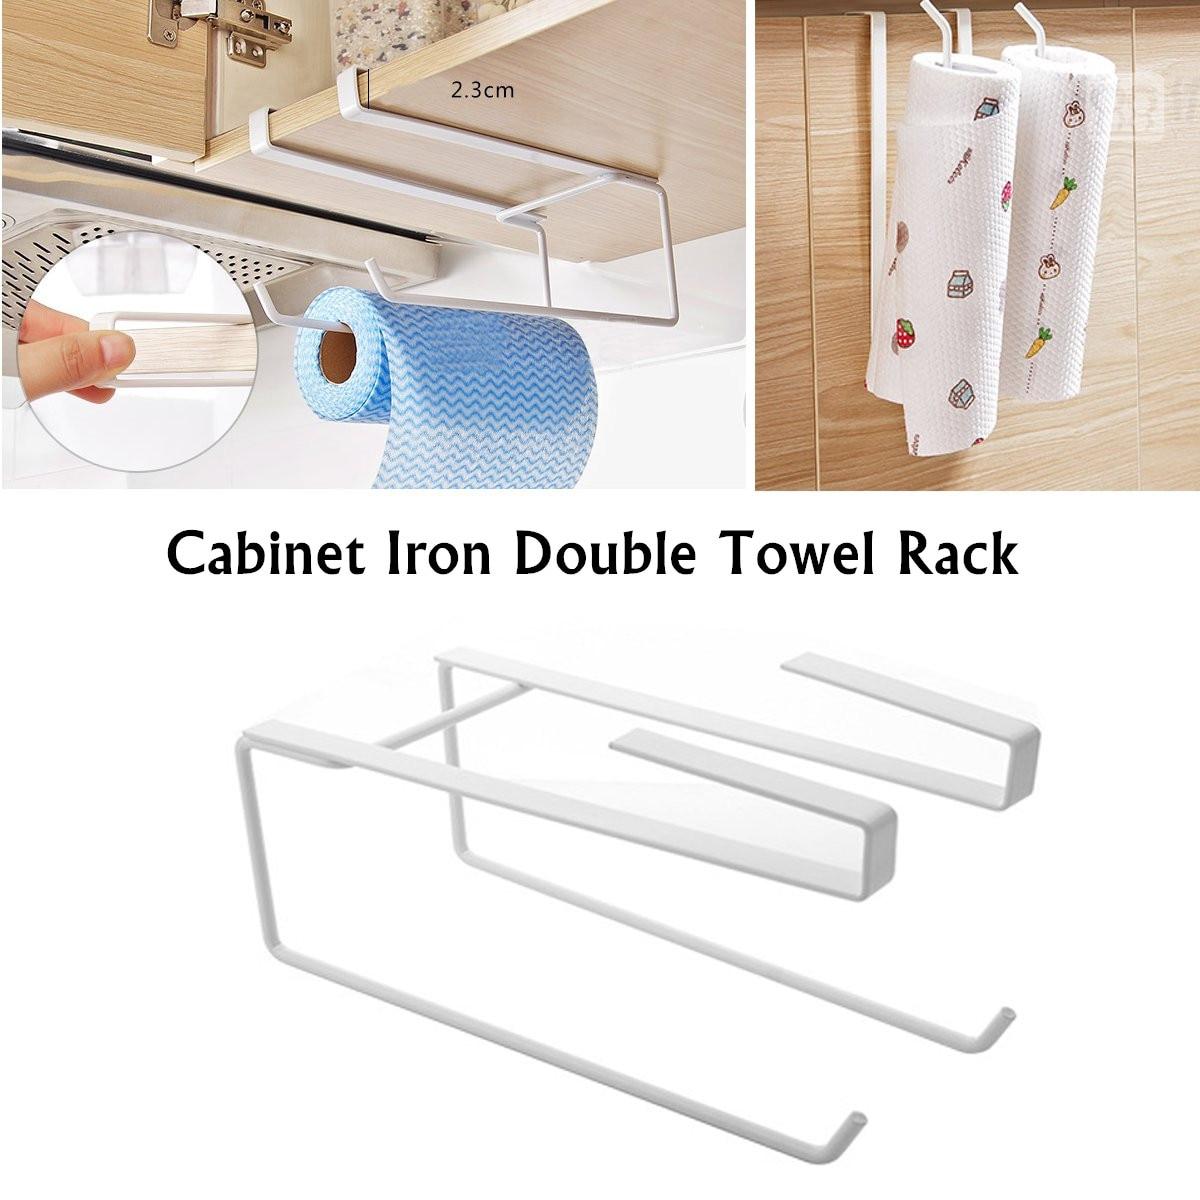 Adhesive Paper Towel Wooden Holder Storage Rack Organizer Tissue Shelf Under Cabinet Cupboard For Kitchen Bathroom Home Qiang Bathroom Fixtures Home Improvement